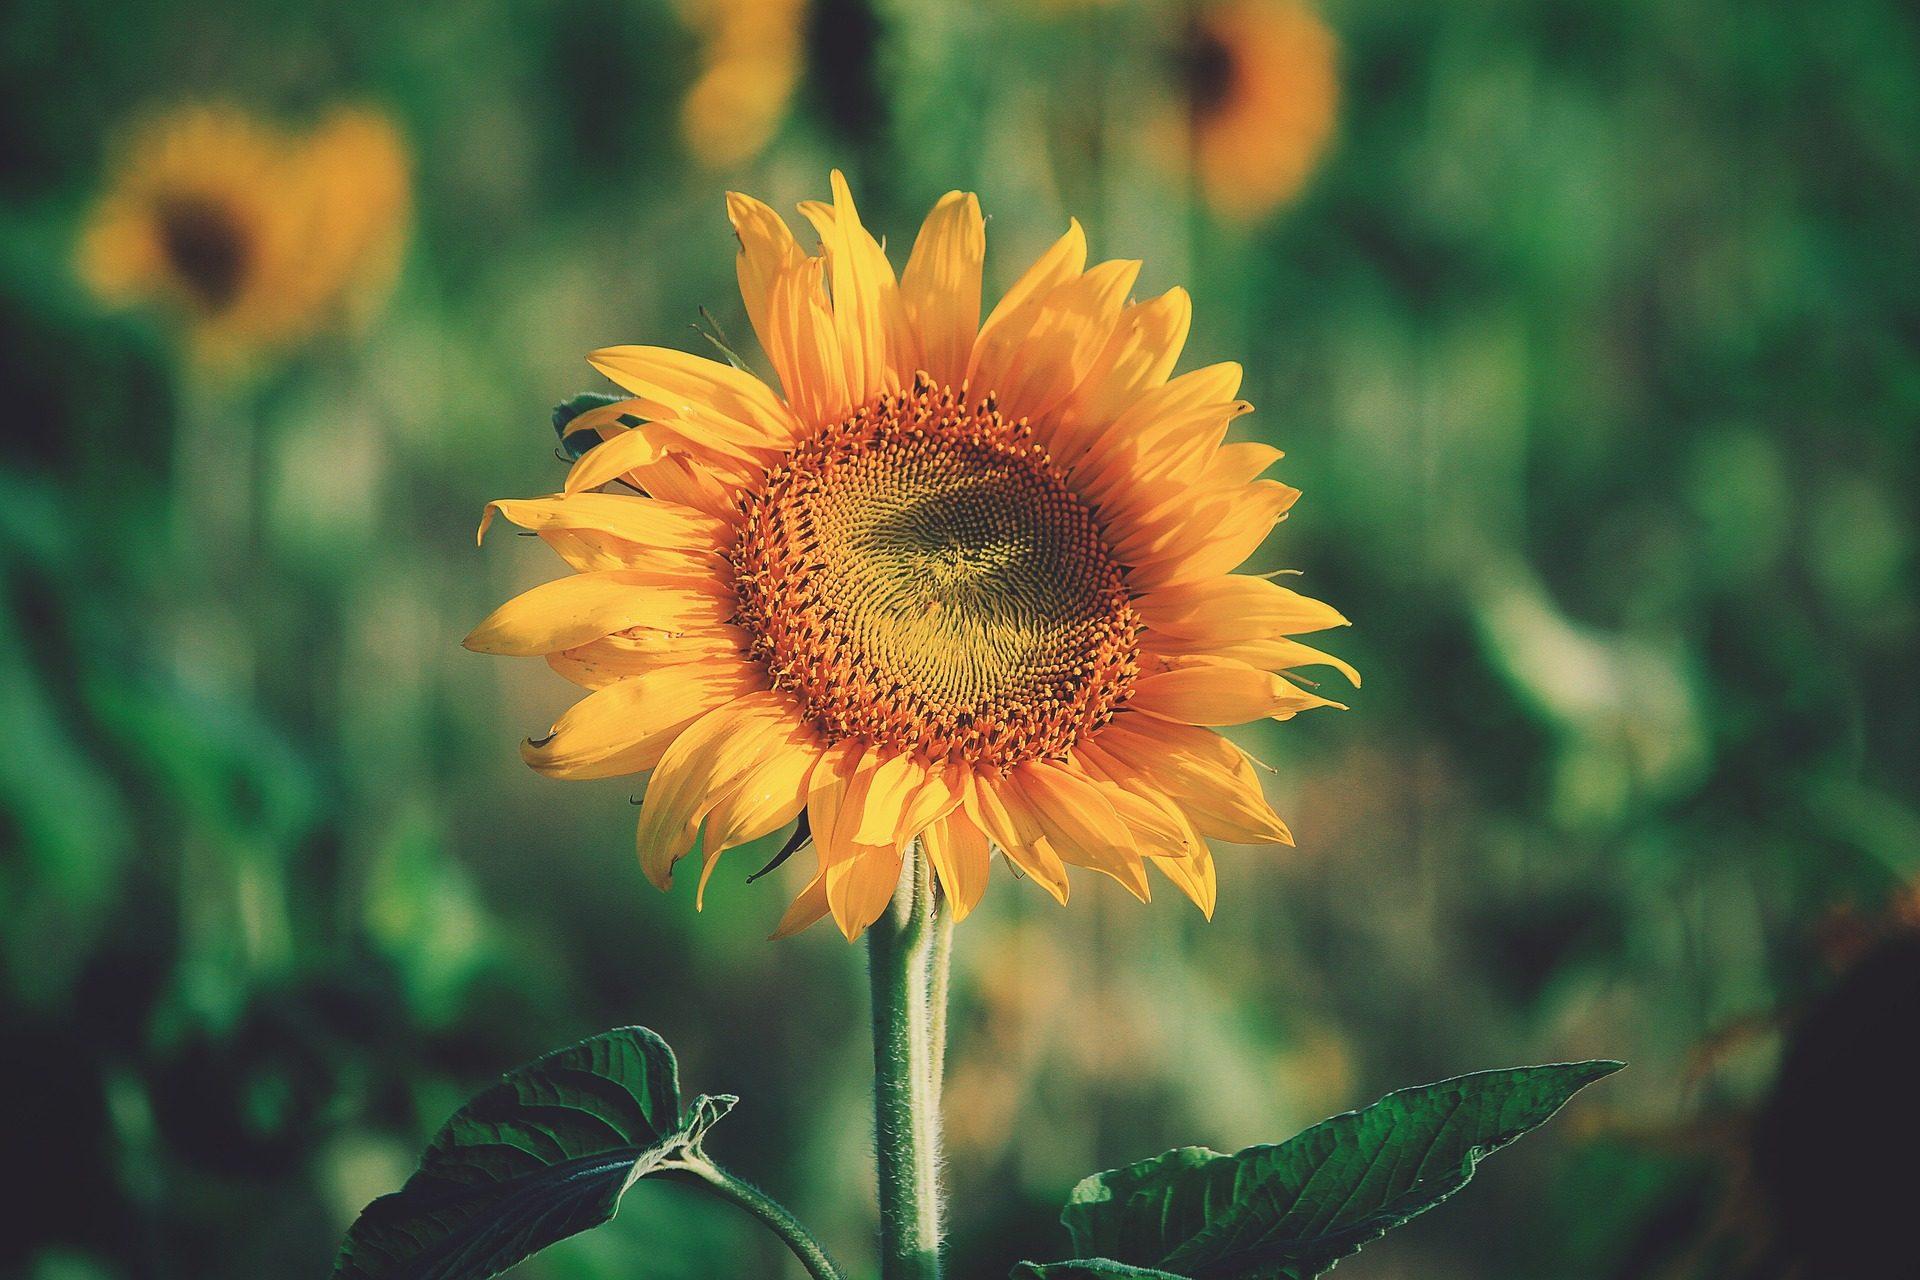 girasol, flor, planta, cultivo, plantación, de cerca - Fondos de Pantalla HD - professor-falken.com